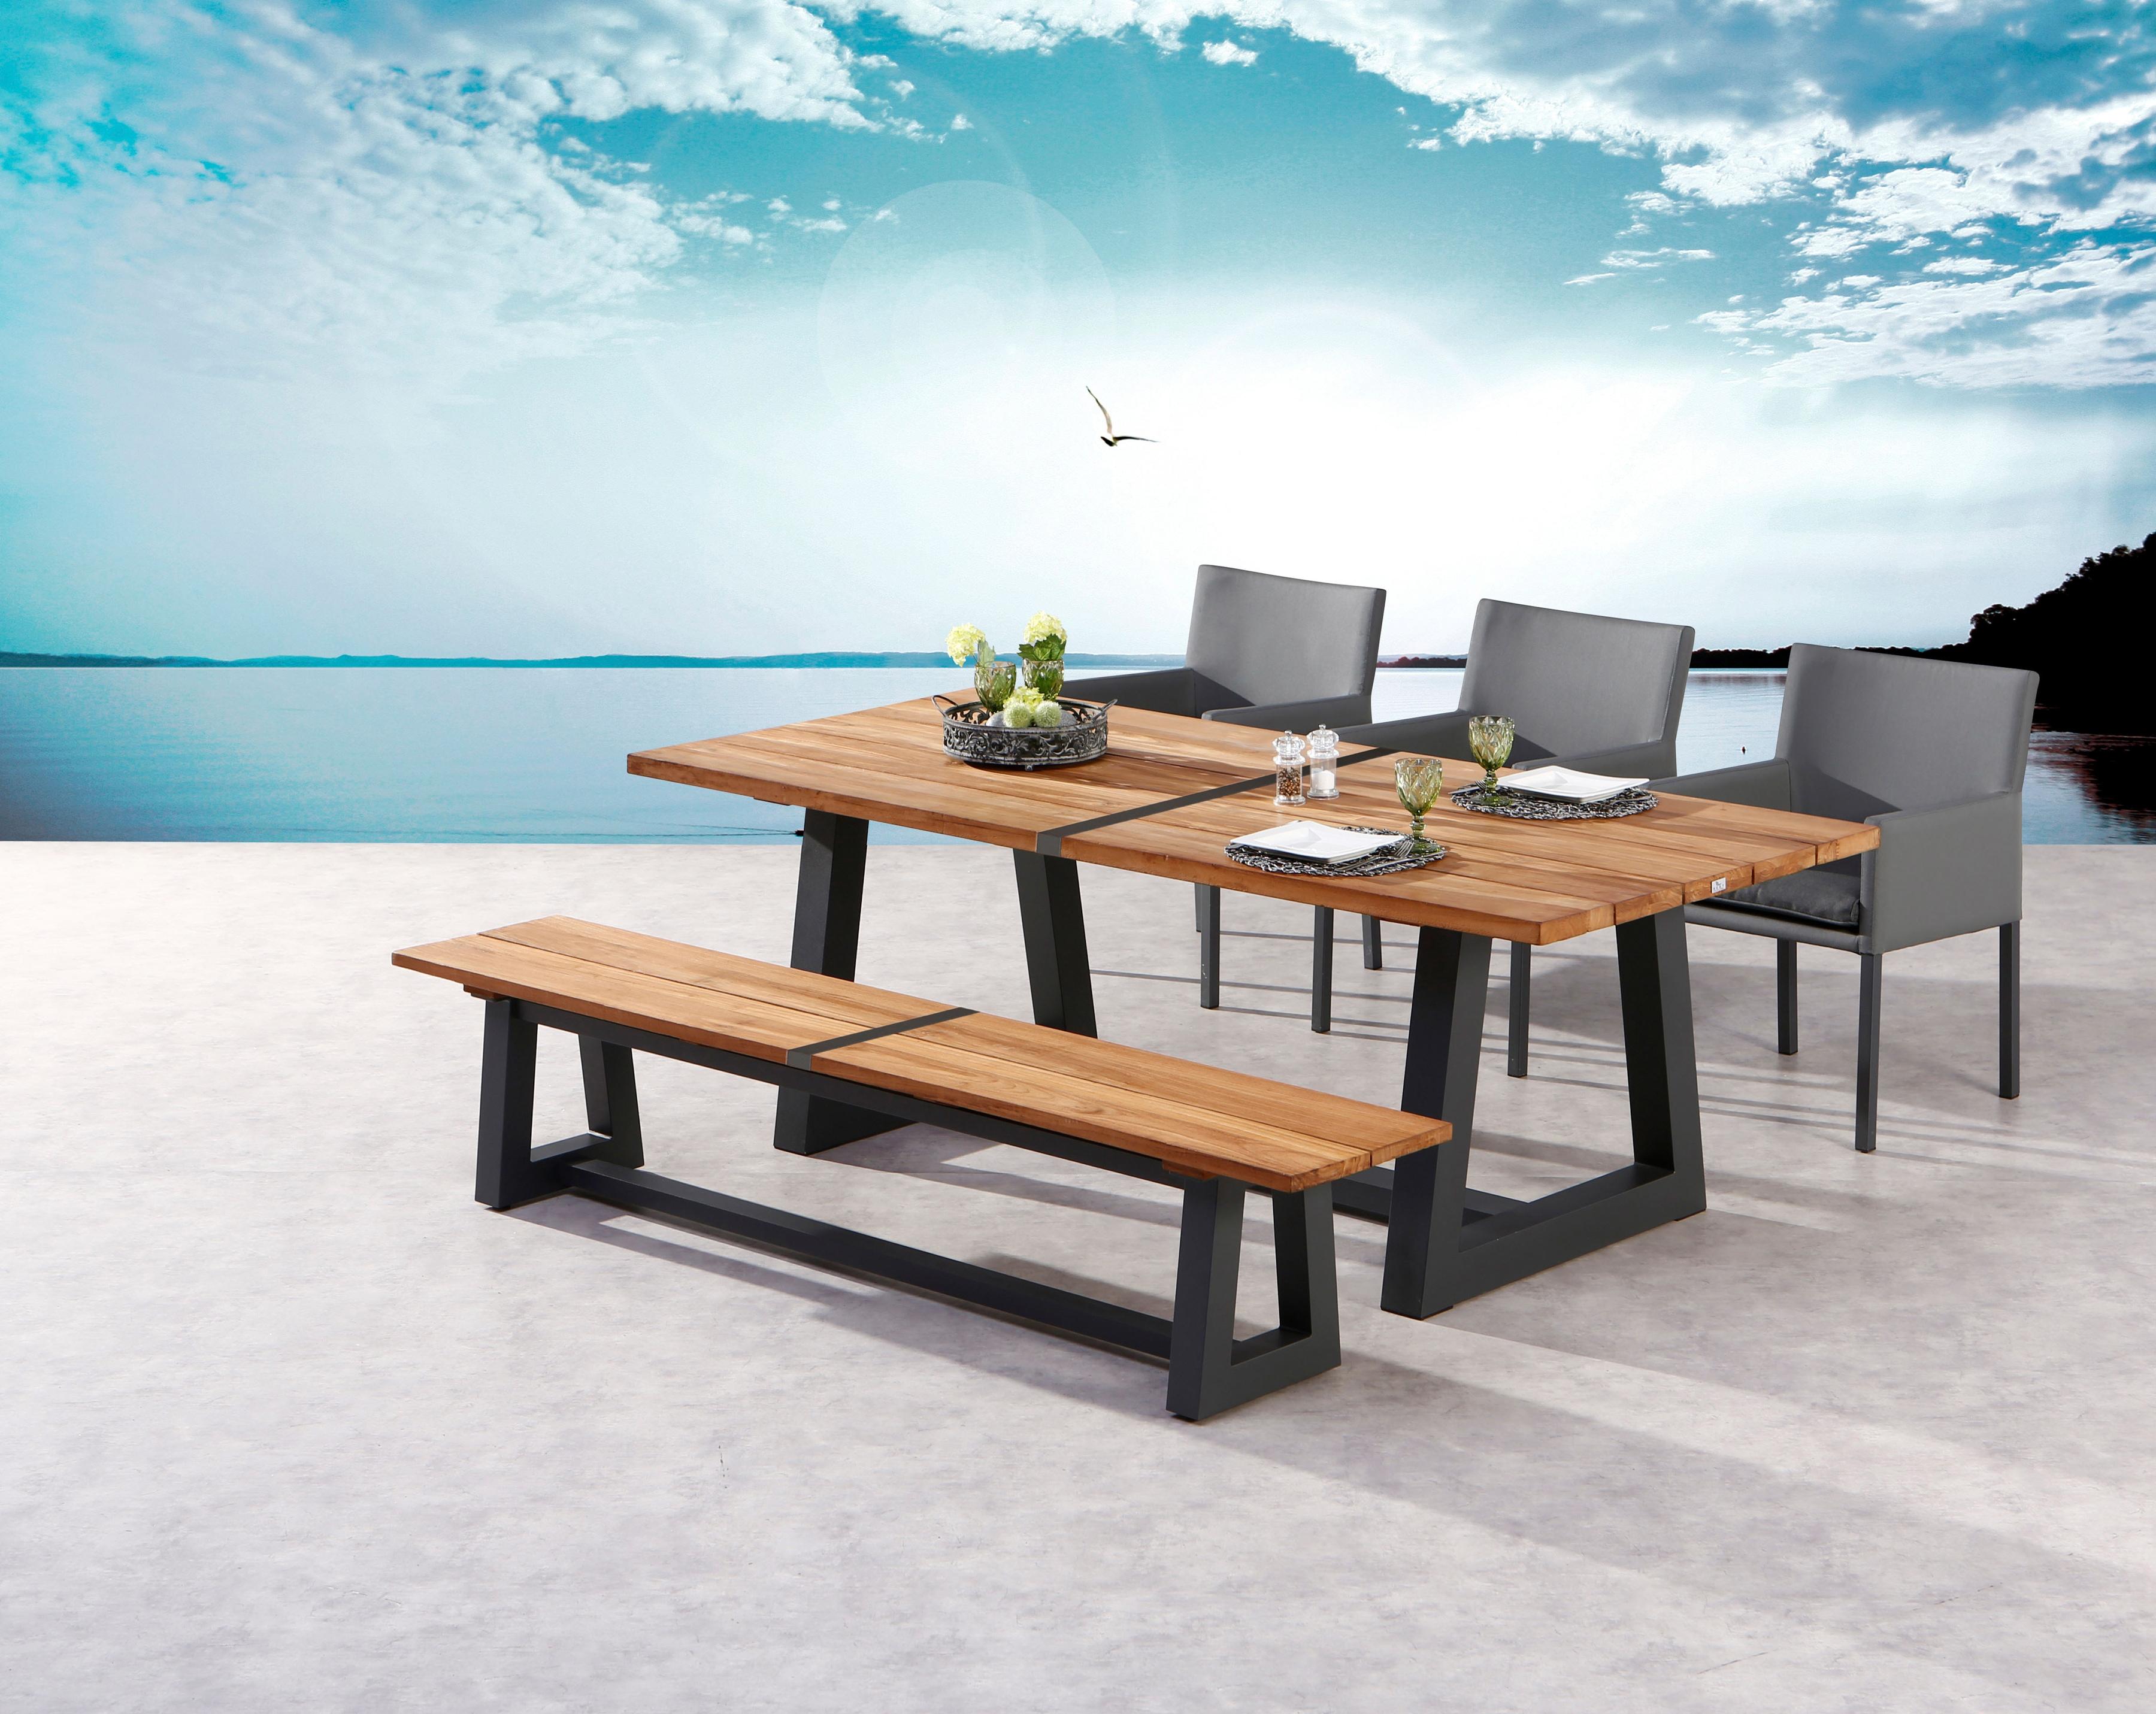 Best Gartenmobelset Campione 5 Tlg 1 Bank 3 Stuhle Tisch 220x100 Cm Teakholz Online Kaufen Quelle At